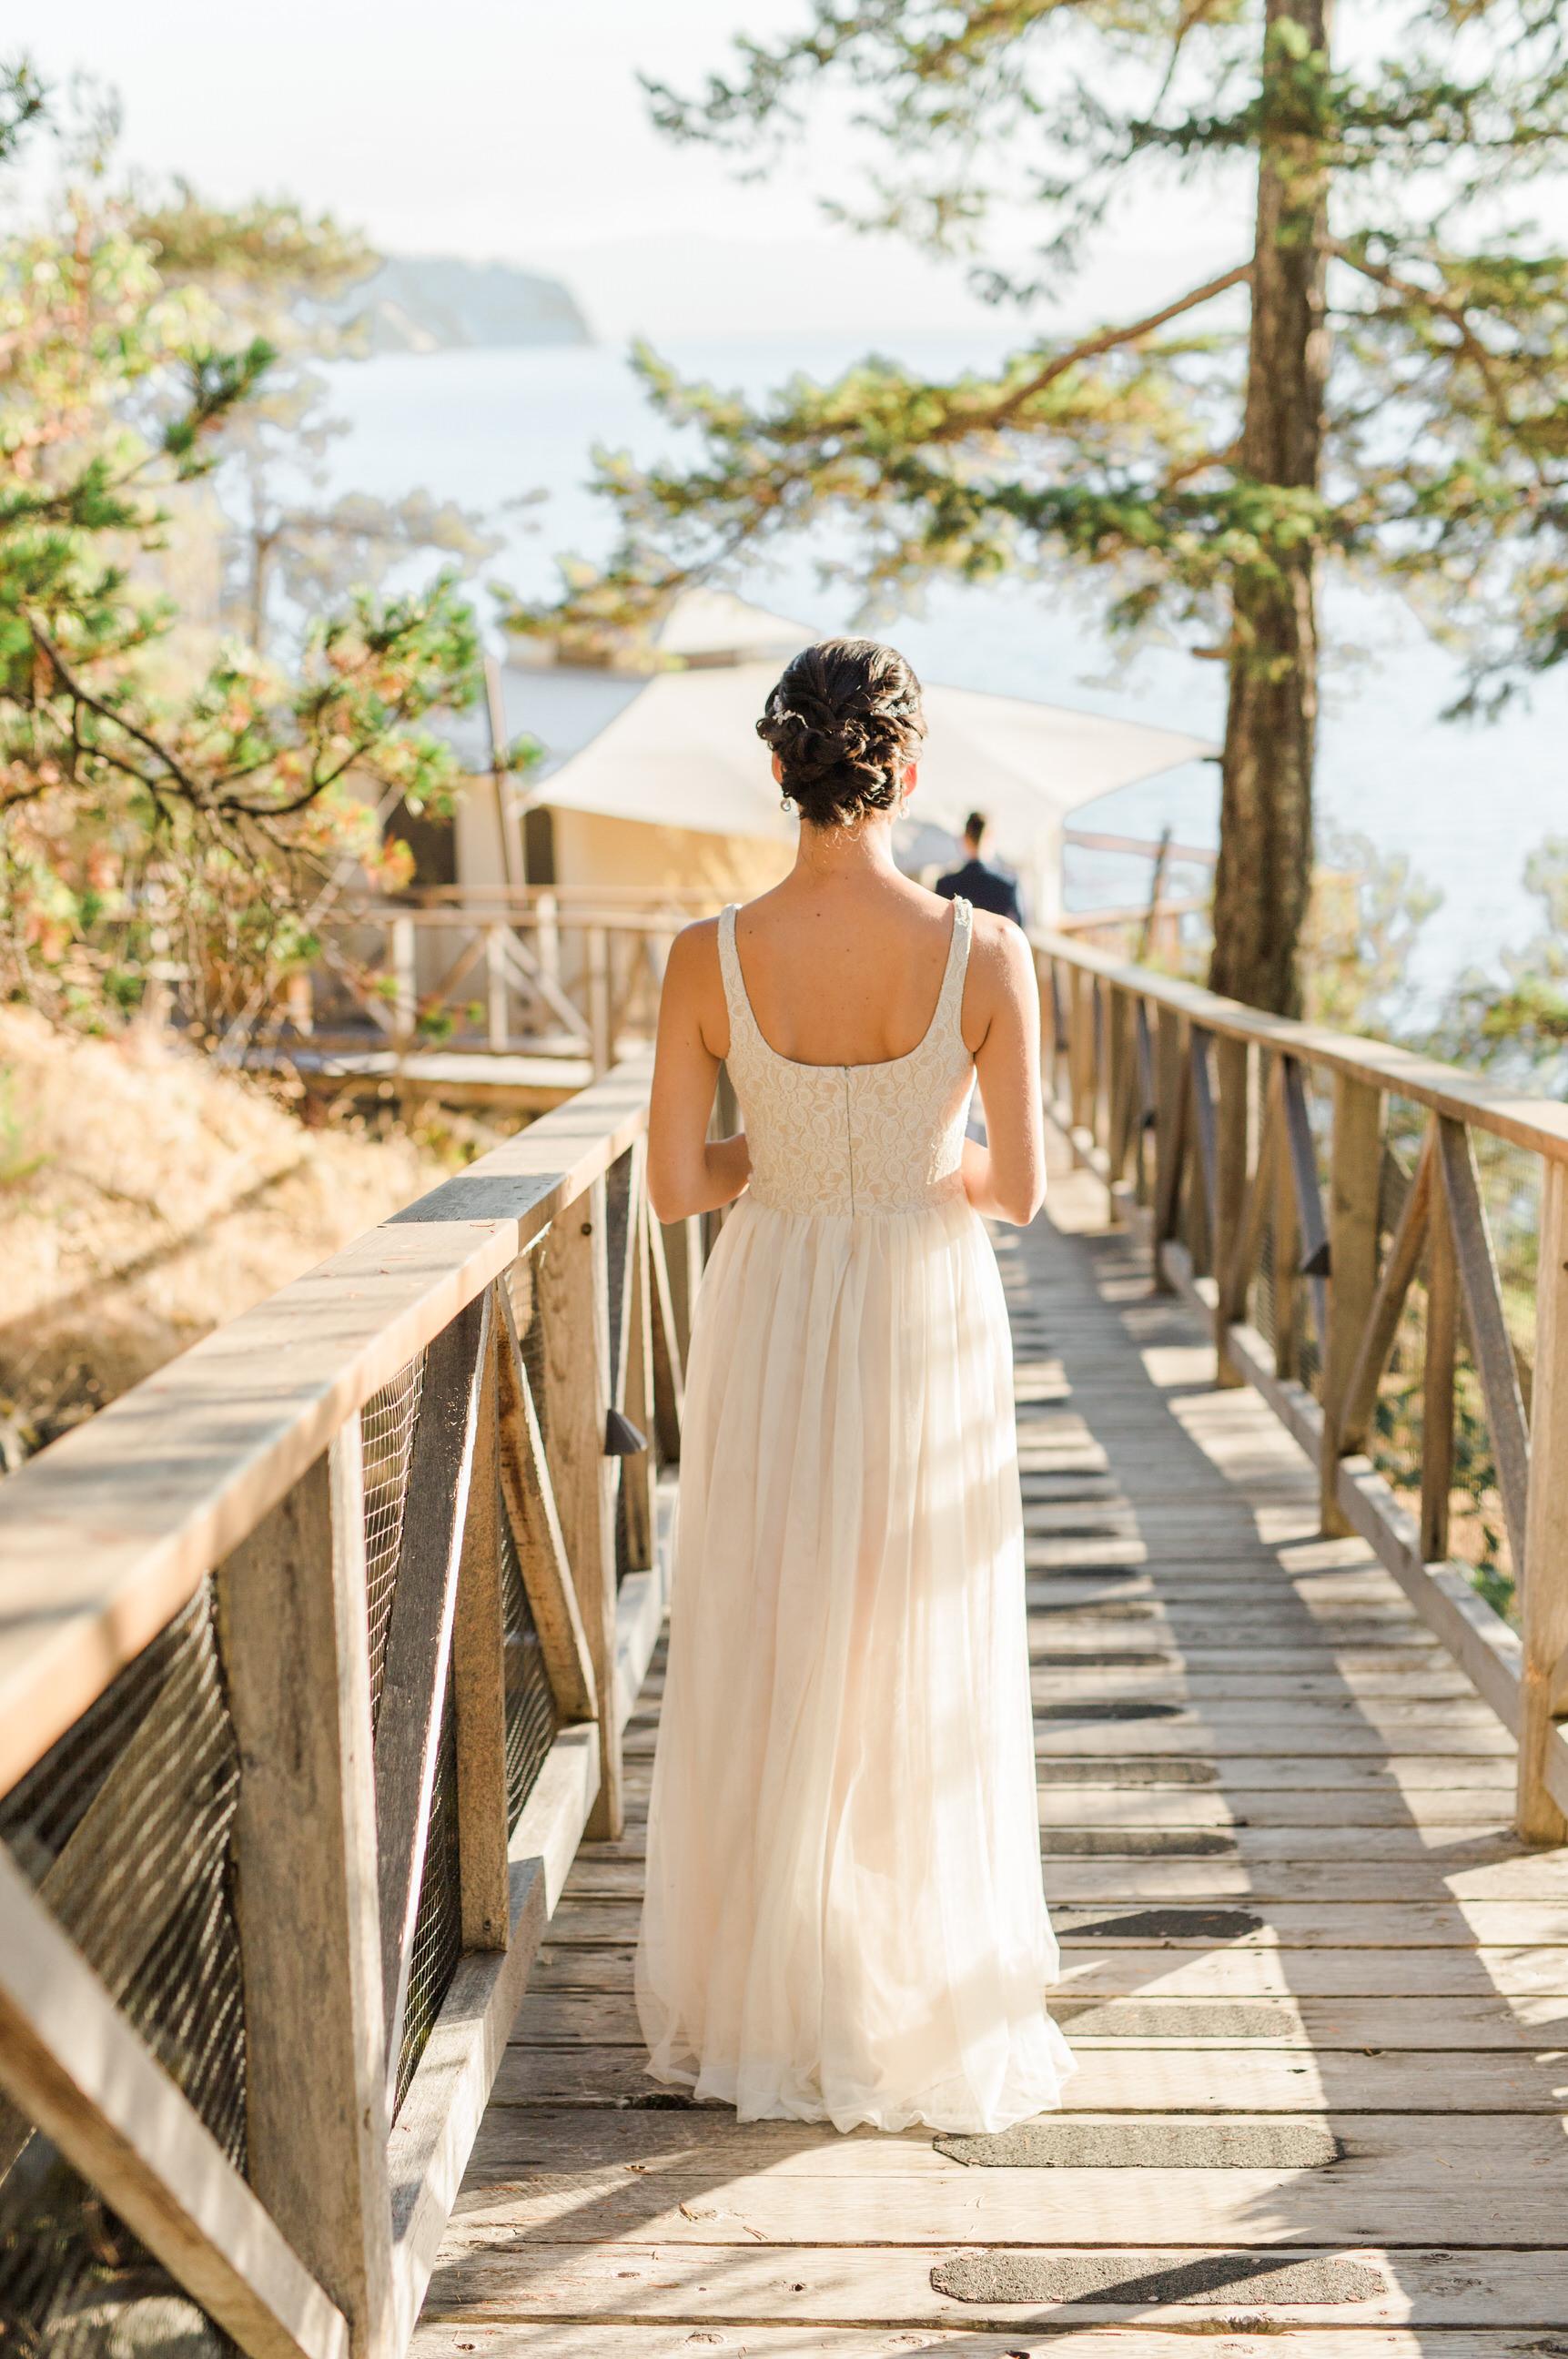 Rockwater Secret Cove Resort Wedding - Sunshine Coast BC Wedding Photographer - Vancouver Wedding Photographer - Sunshine Coast Elopement Photos - IMG_0209.jpg